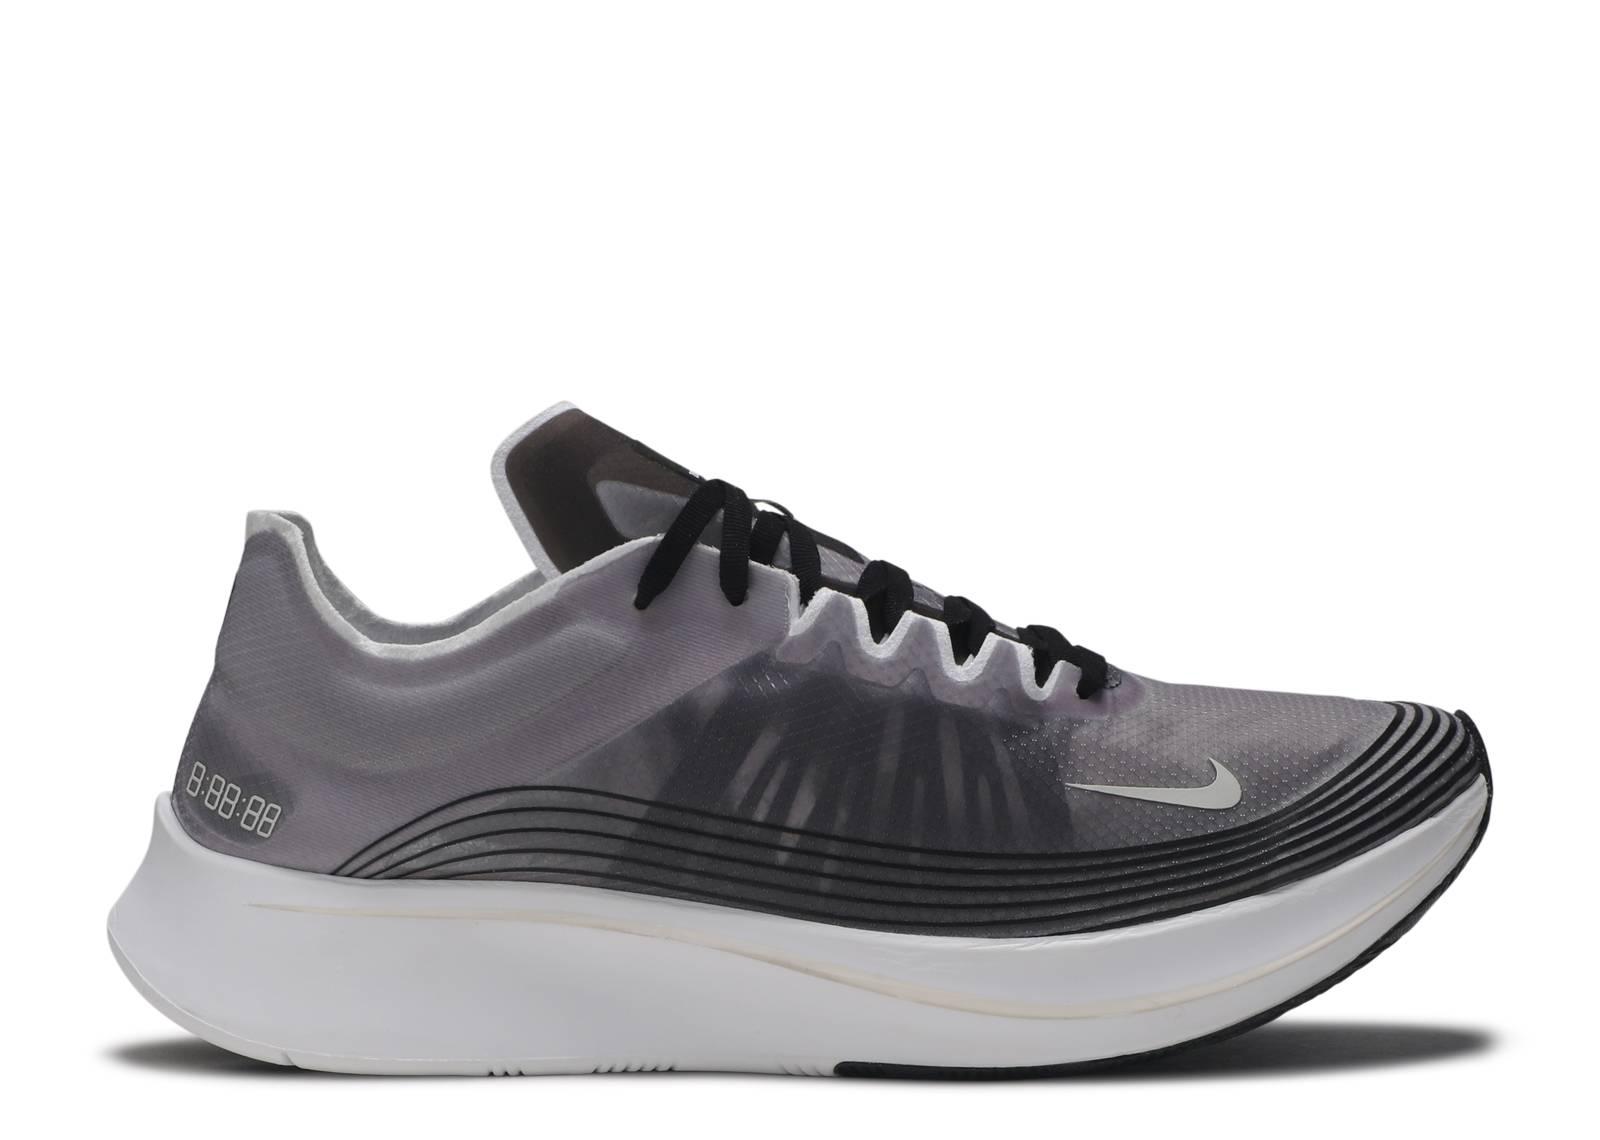 748e8fc363a Nike Zoom Fly Sp - Nike - aj9282 001 - black light bone-white ...